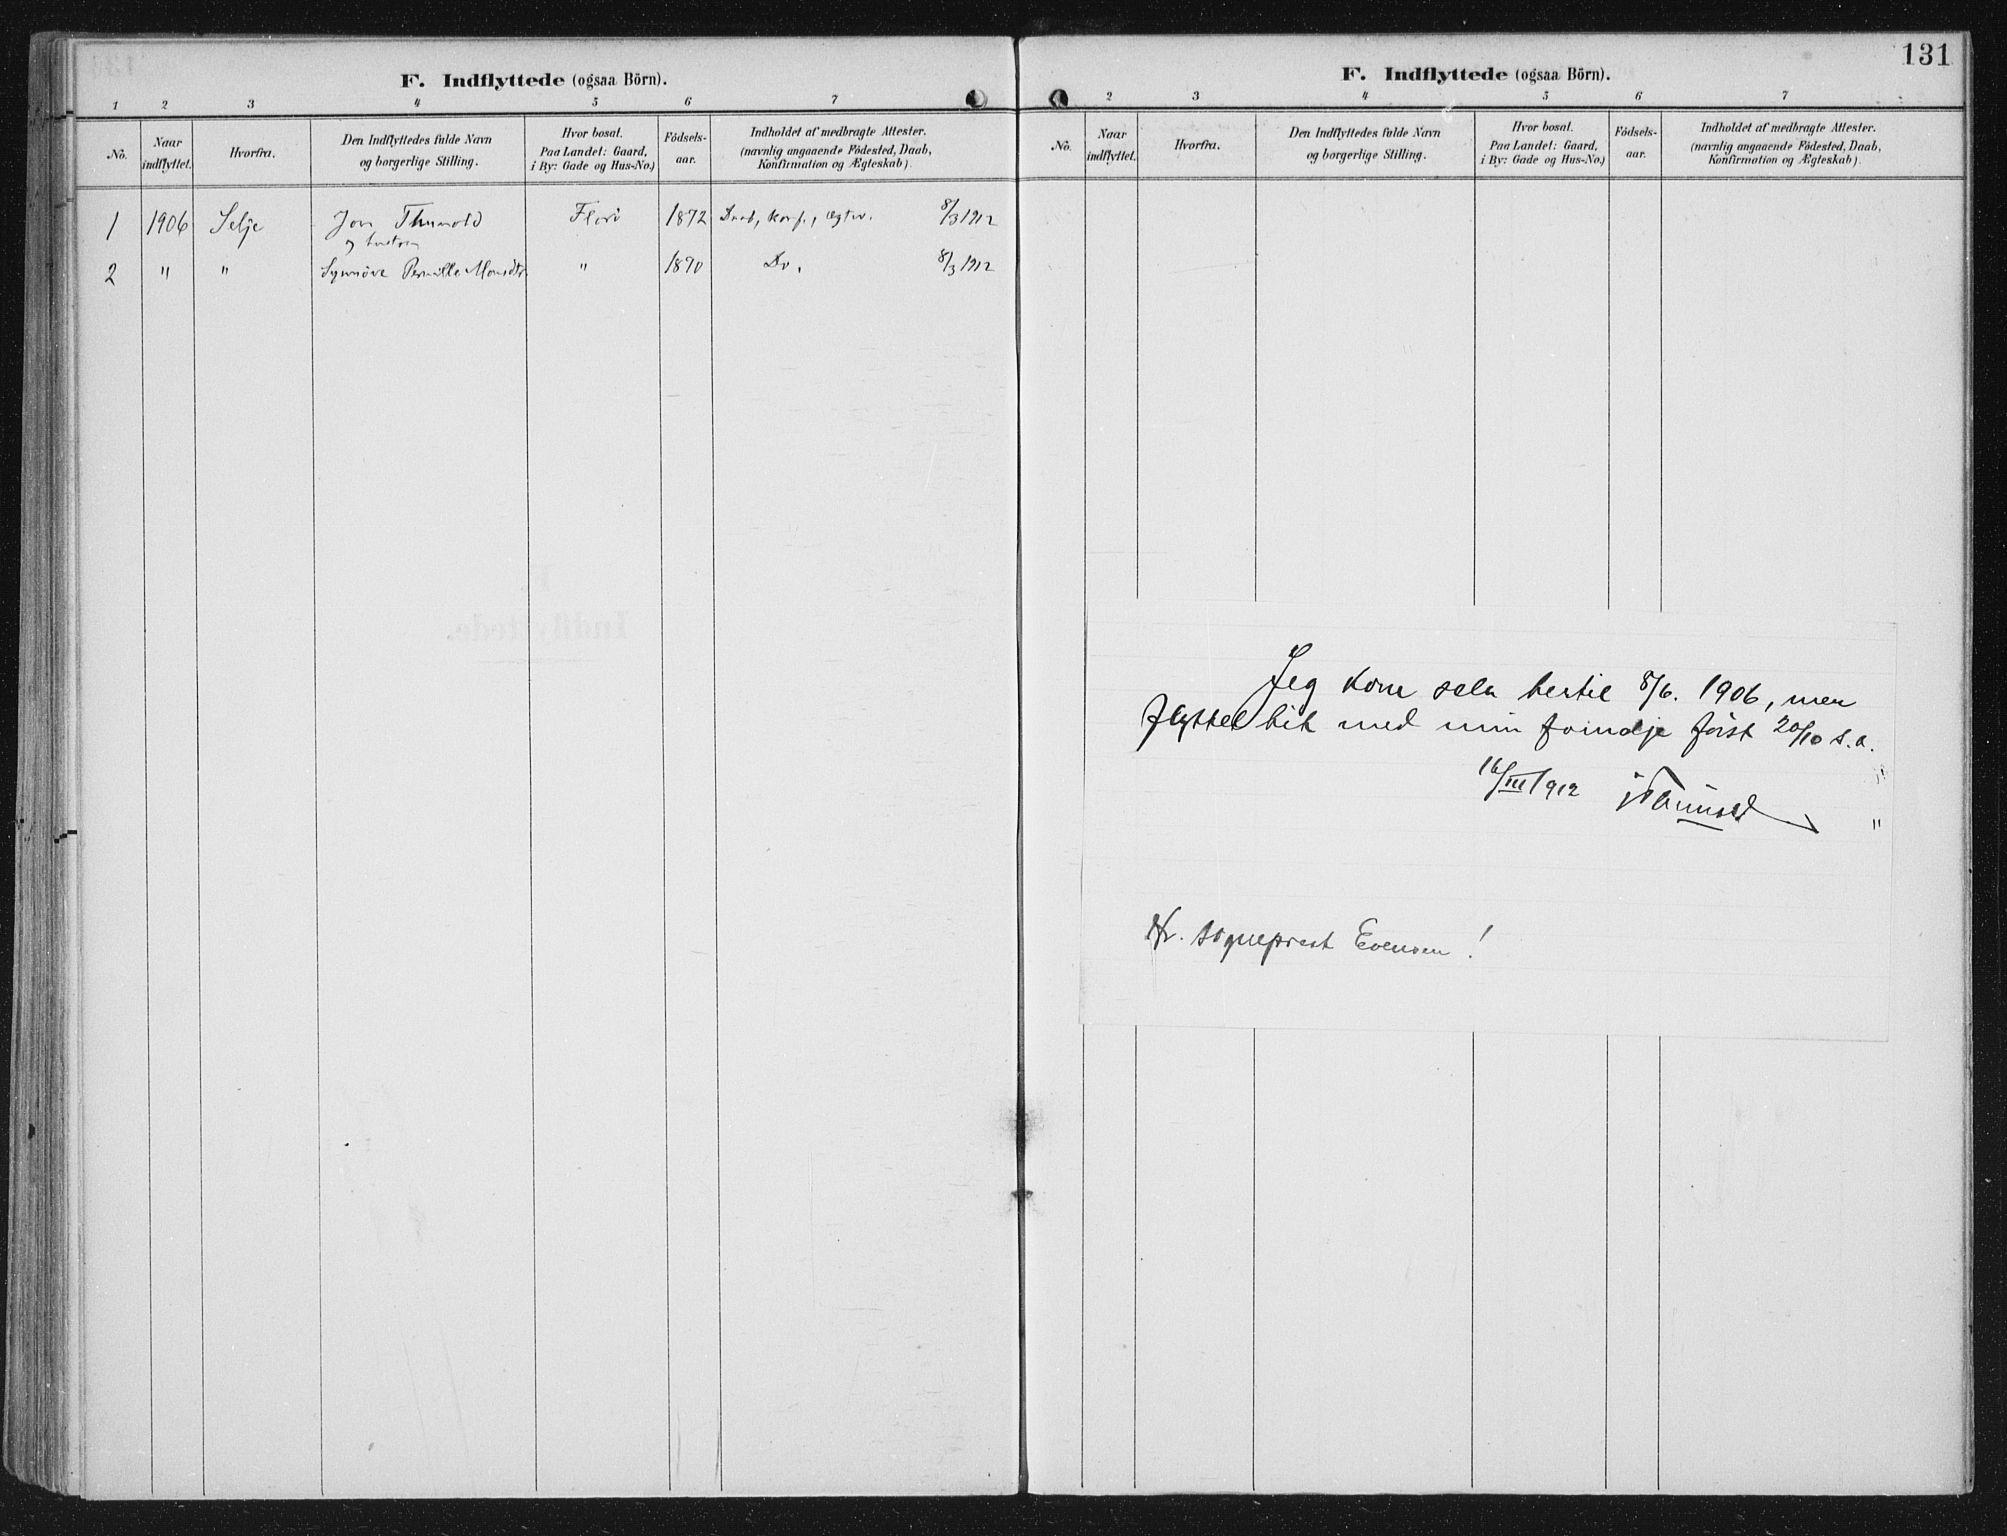 SAB, Kinn sokneprestembete, H/Haa/Haac/L0002: Ministerialbok nr. C  2, 1895-1916, s. 131